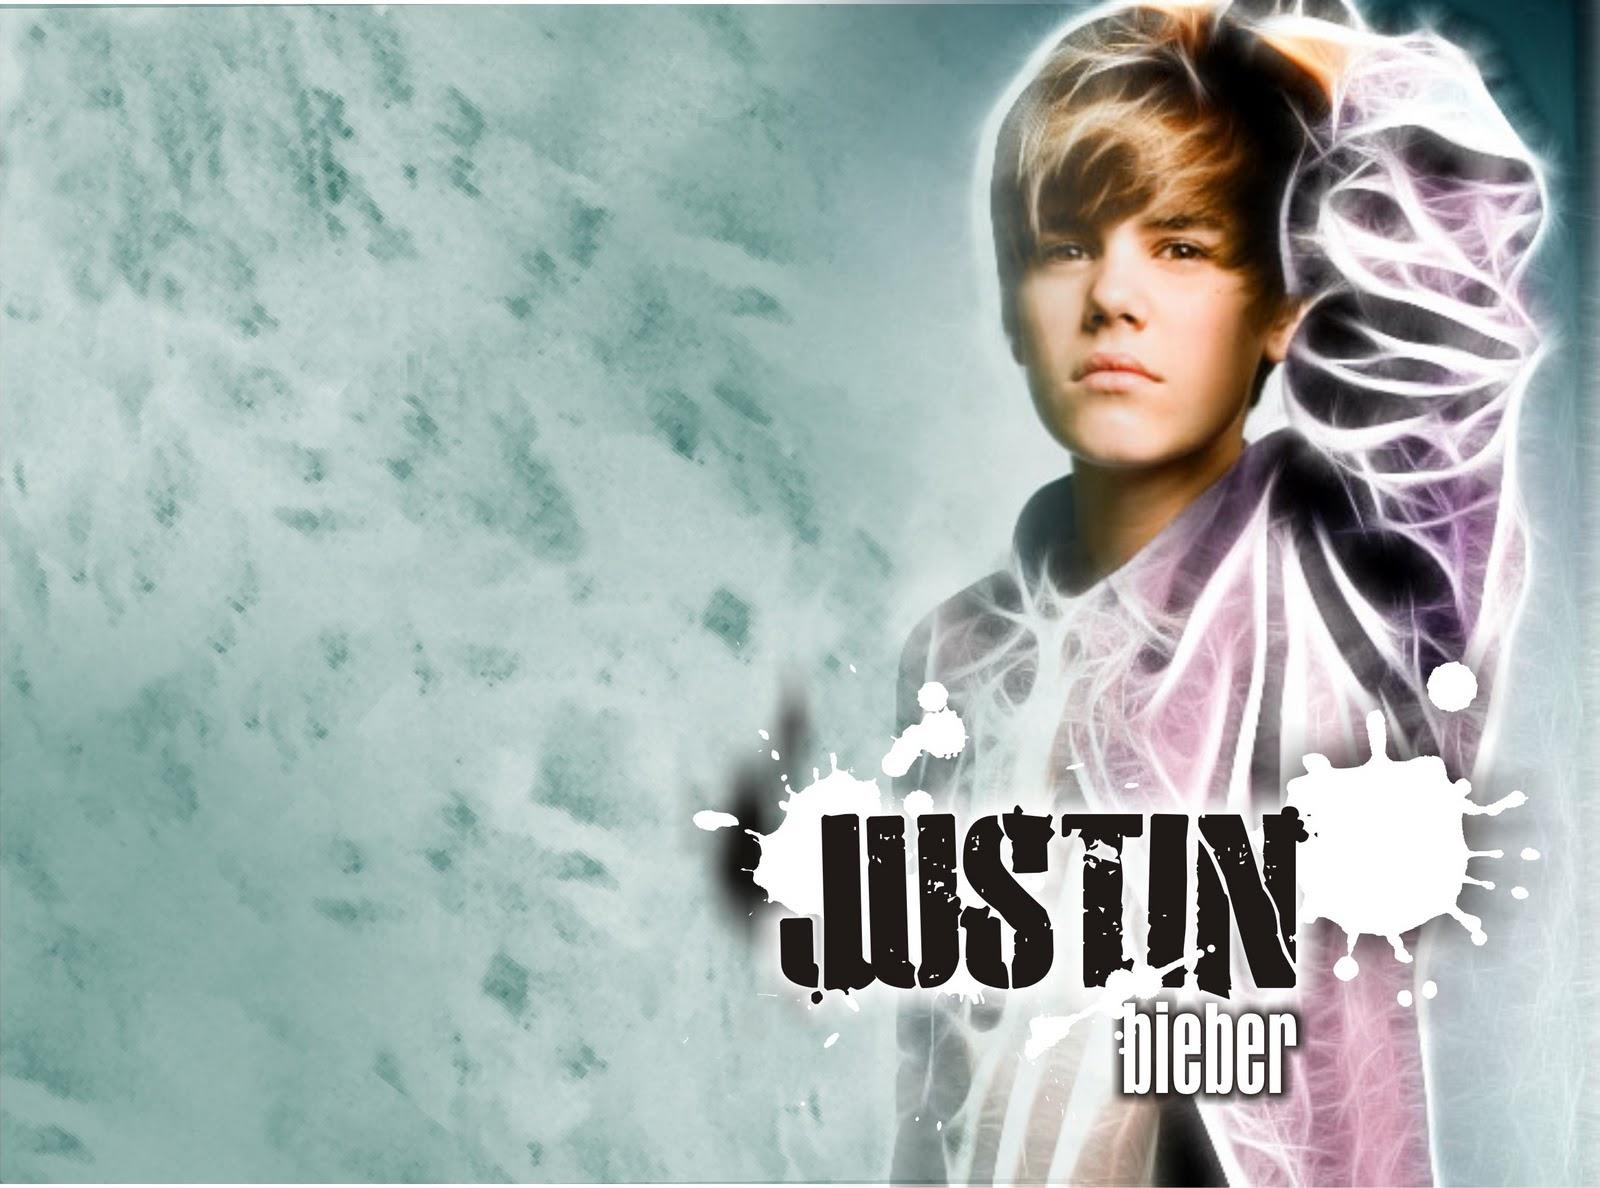 http://3.bp.blogspot.com/-OOBY1lMZAaM/UP65YT_0EXI/AAAAAAAAF1Y/pZDV5AIh7AA/s1600/Justin+Bieber+Wallpaper+HD+2013+20.jpg